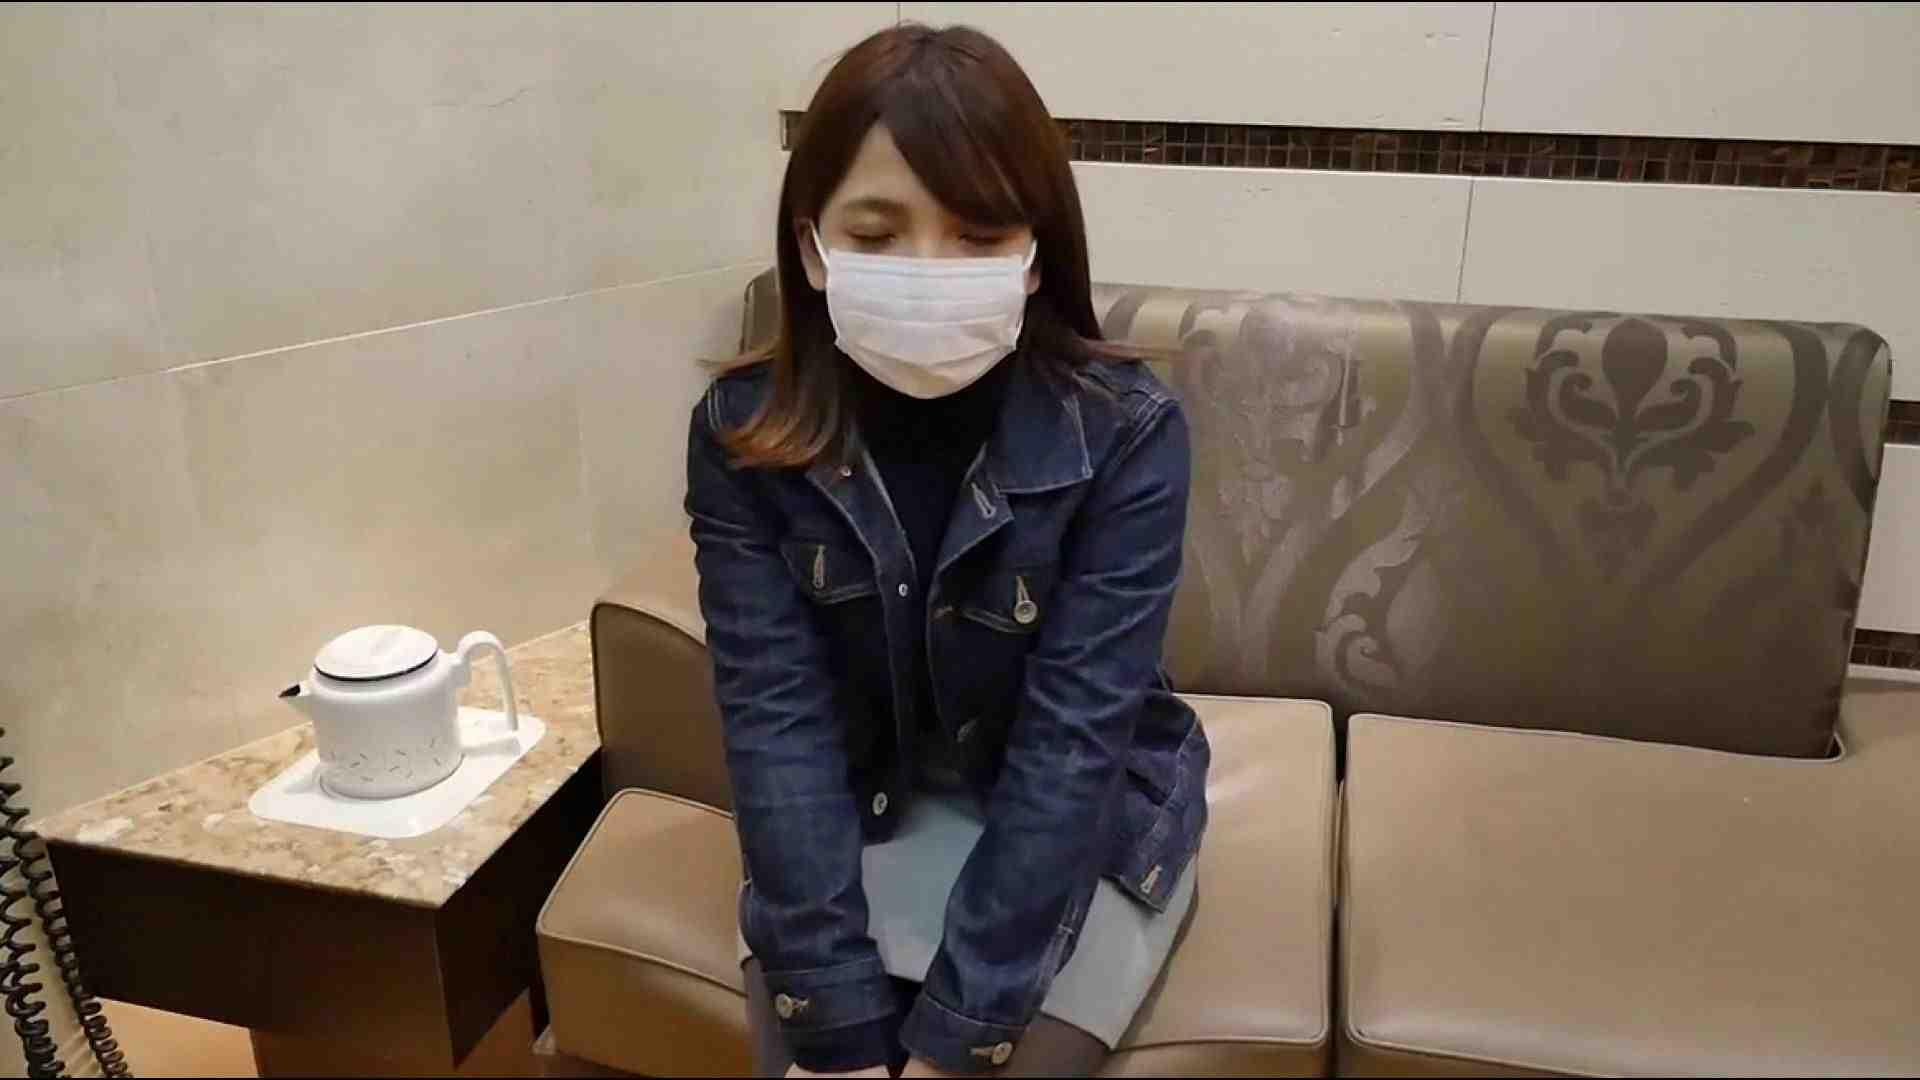 S級厳選美女ビッチガールVol.41 前編 OL女体   美女  105連発 1